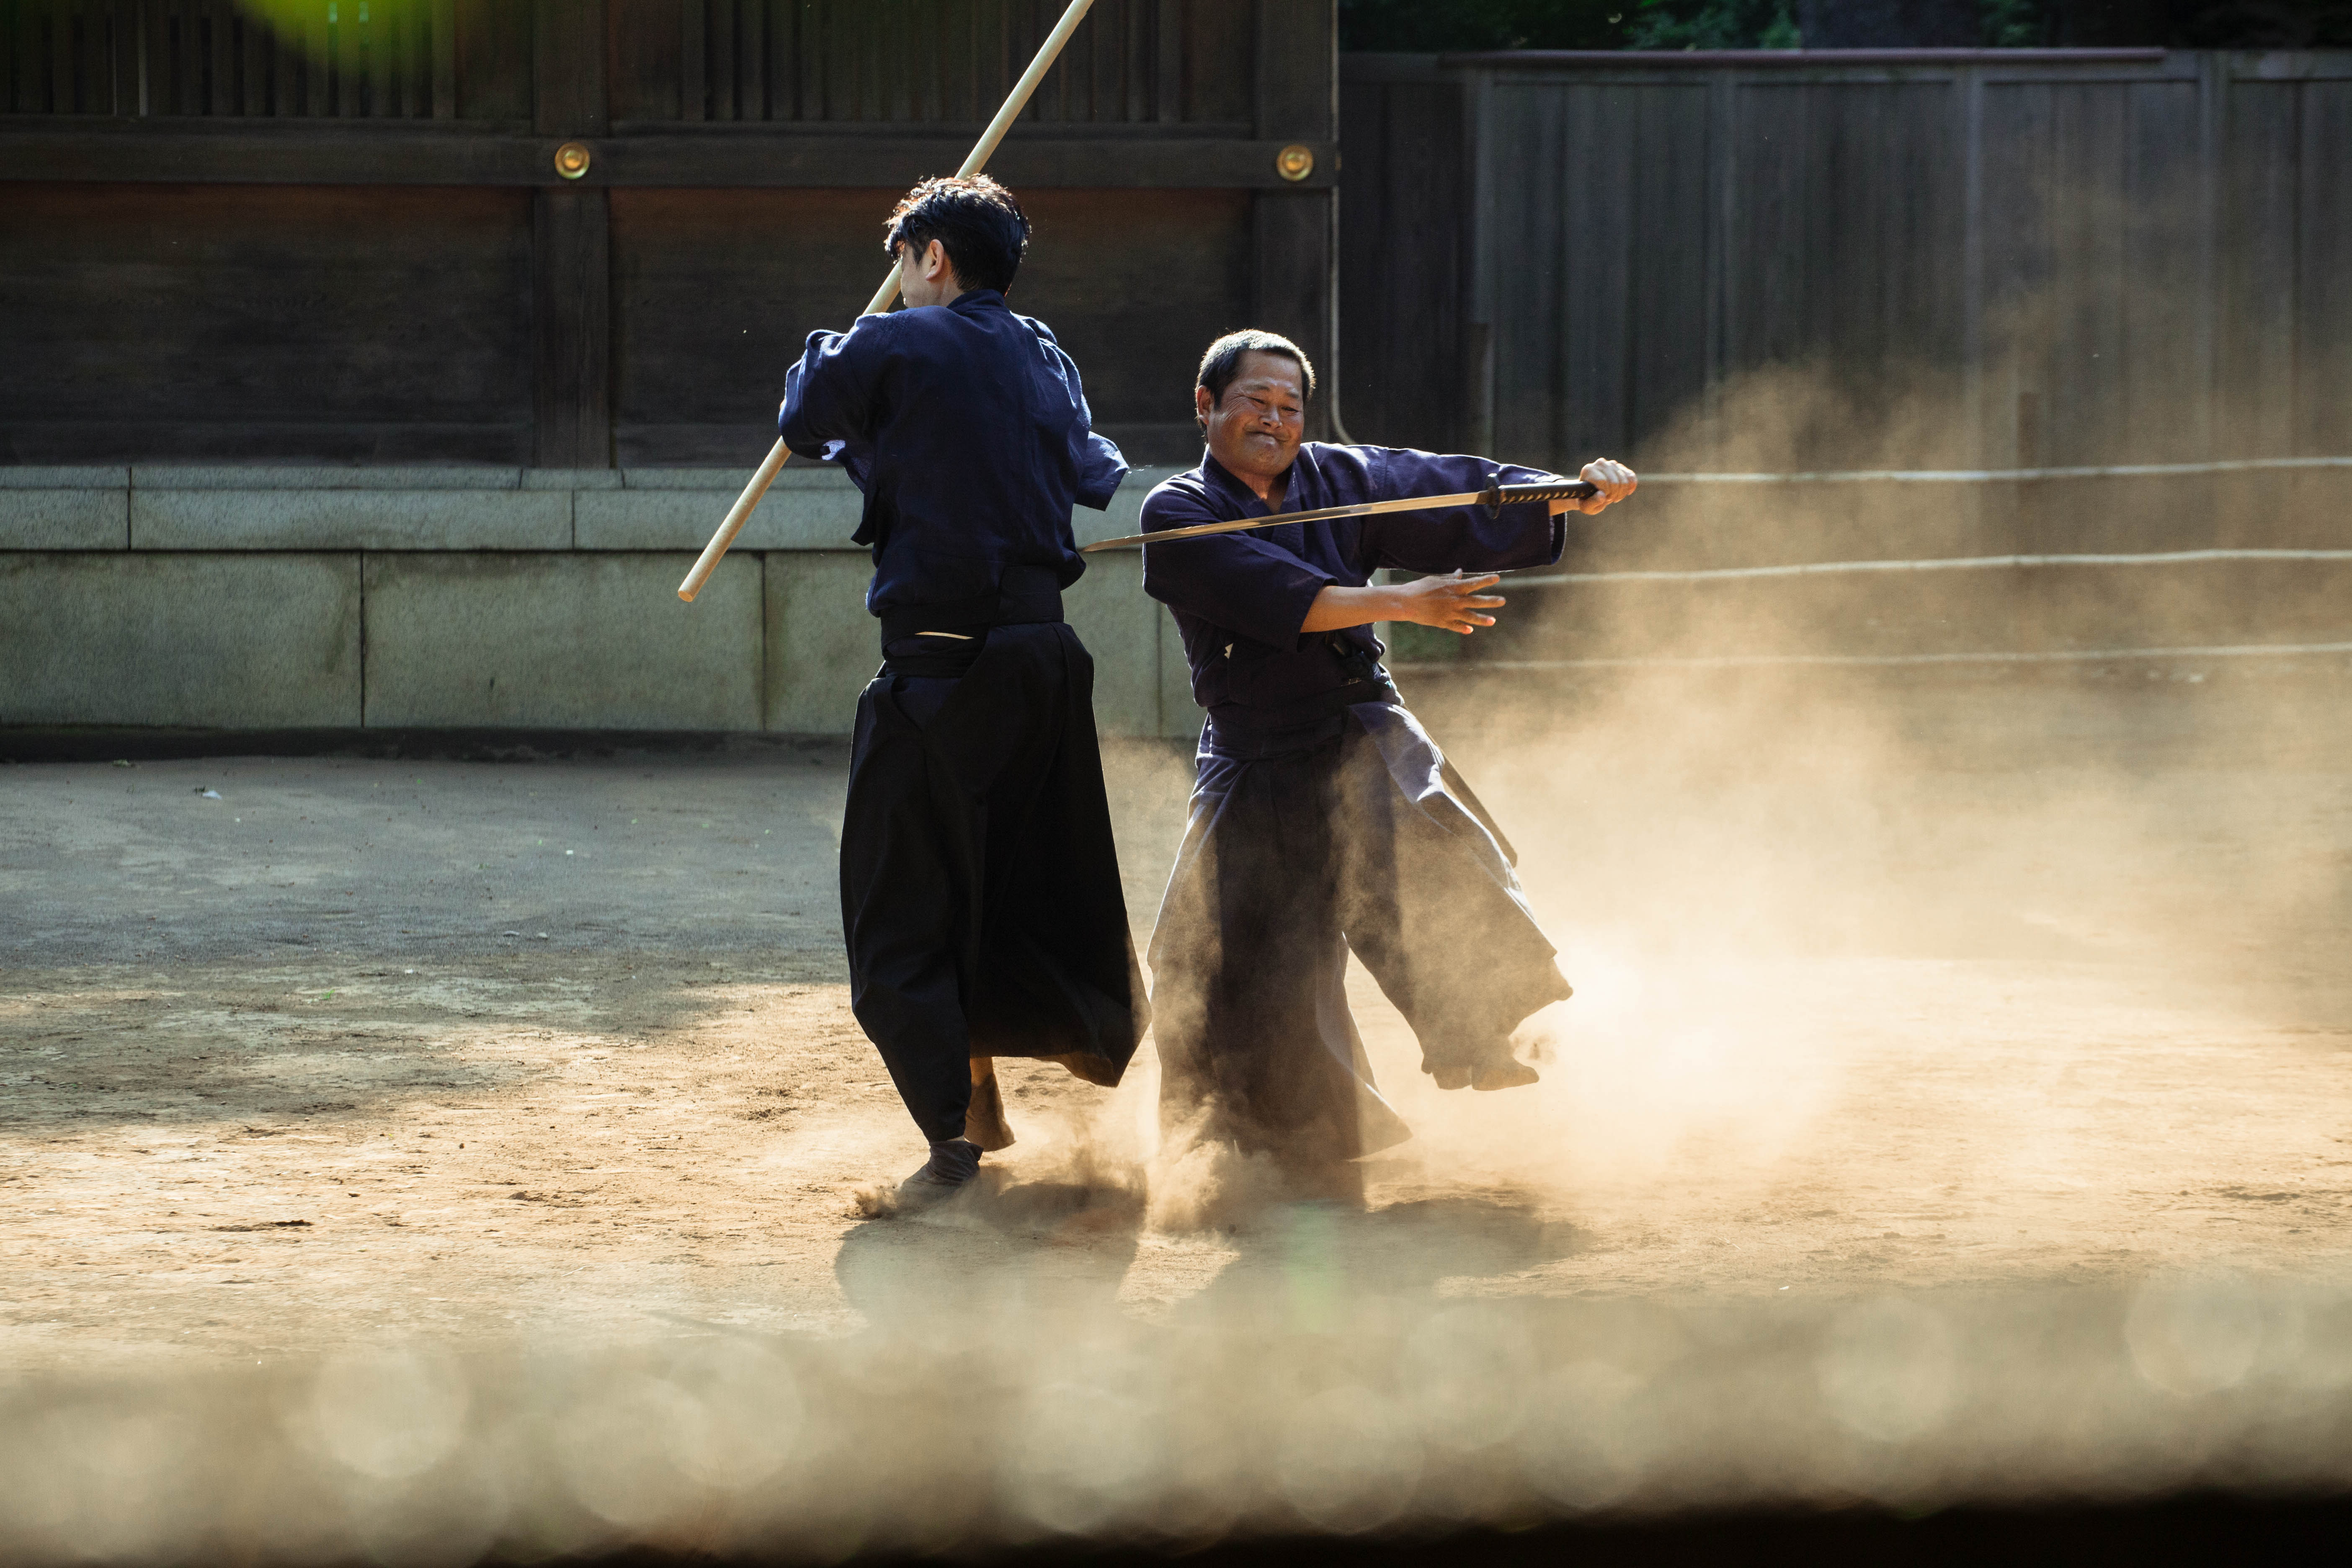 SamuraiLethal